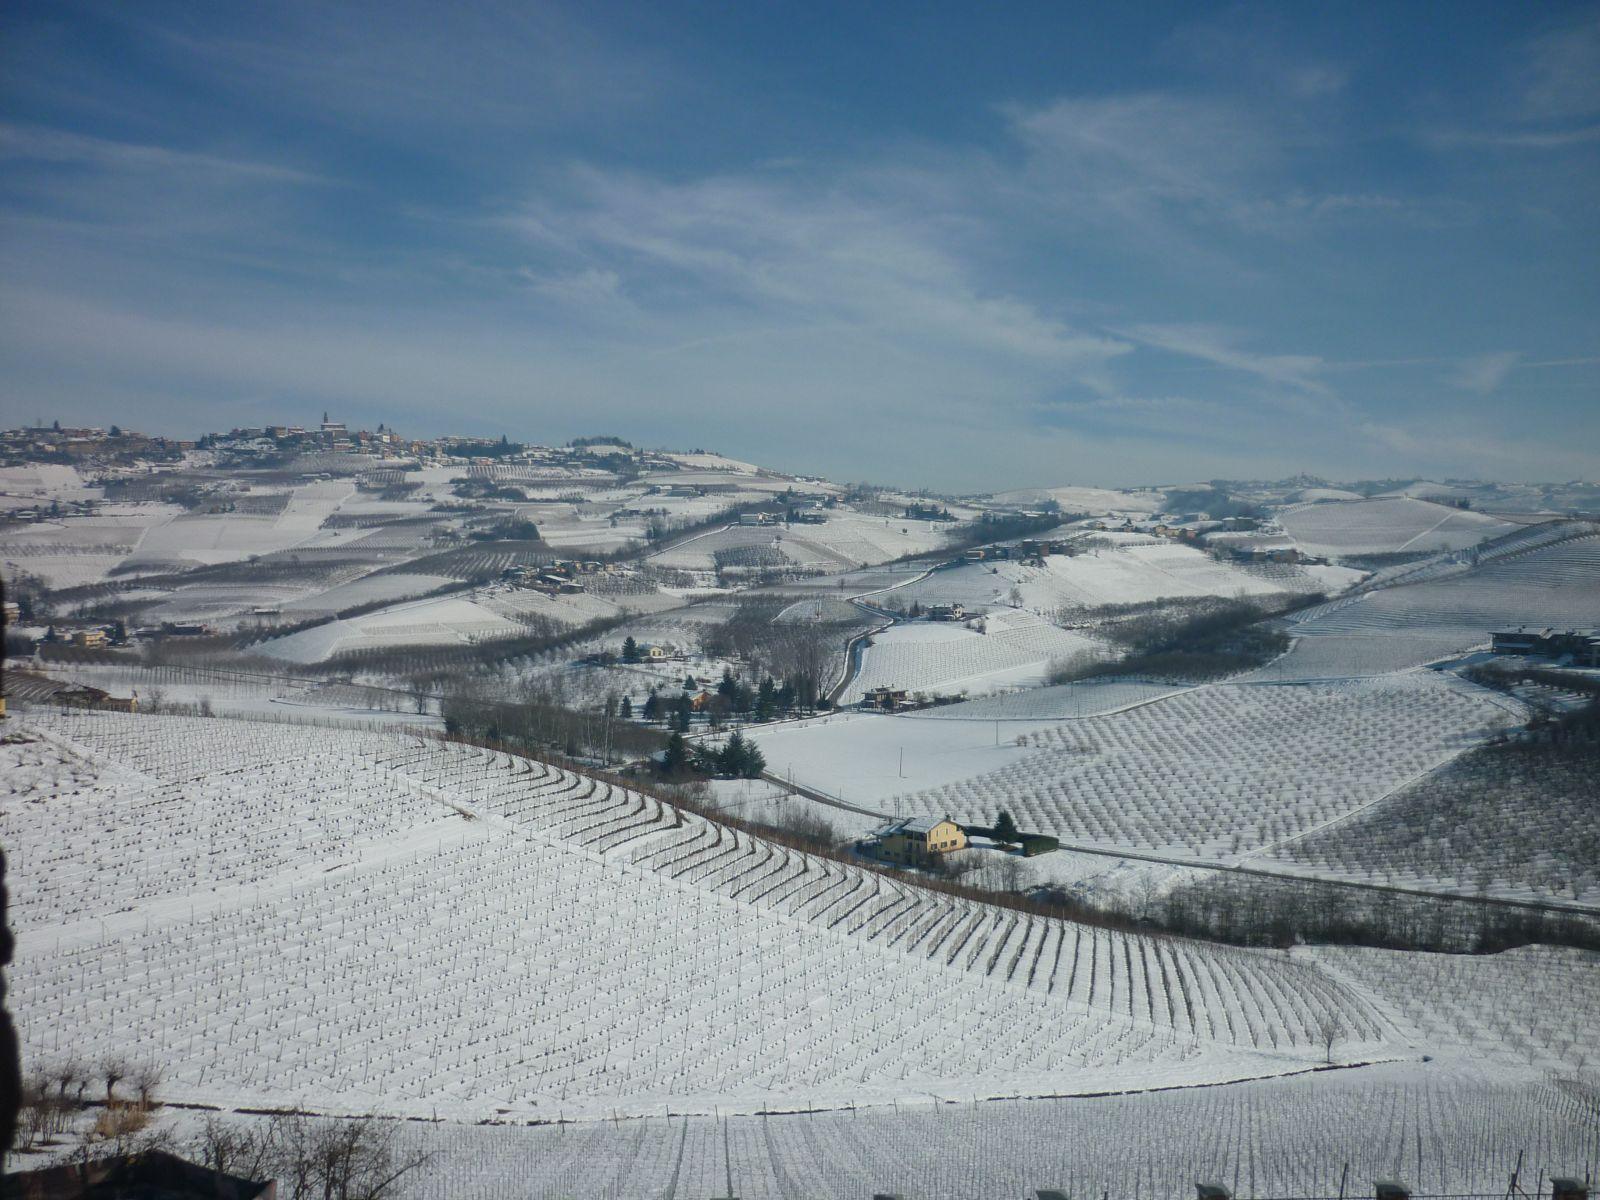 WinterlandscapePiedmonteItaly2.JPG